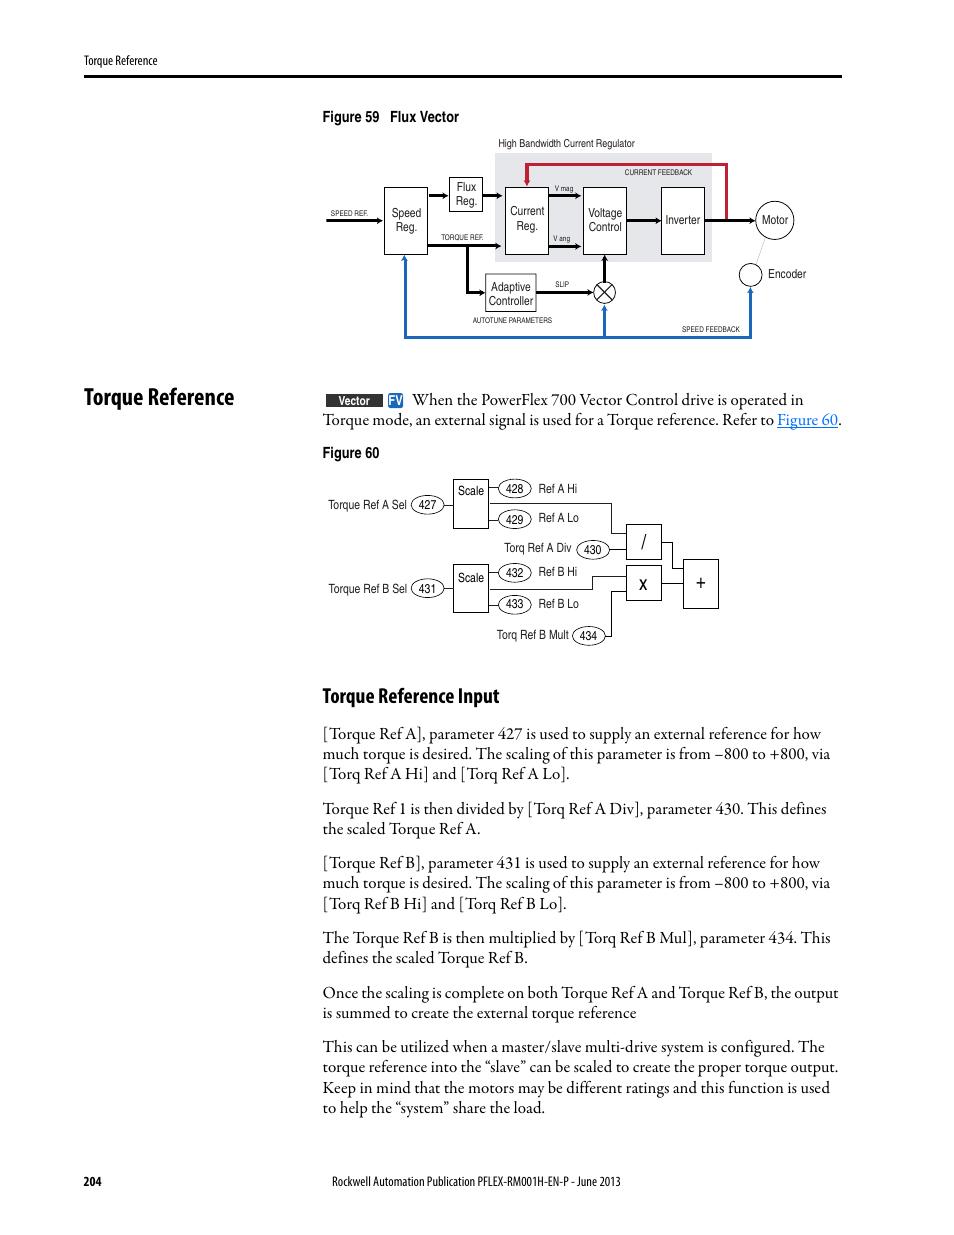 Powerflex 700 Feedback Wiring Diagram Libraries Rockwell